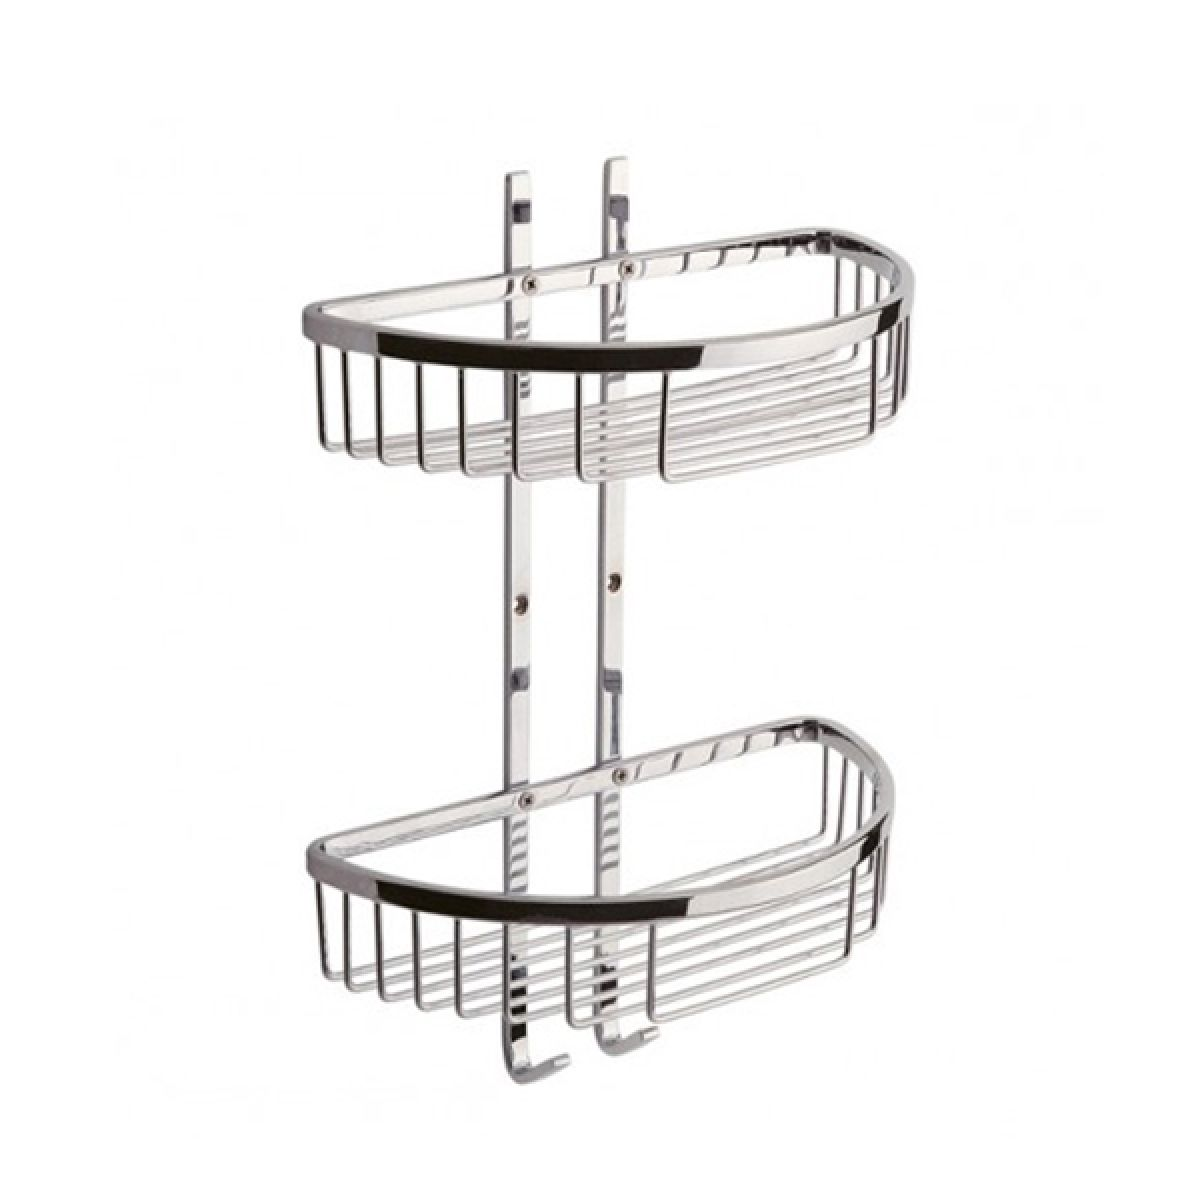 Vitra Arkitekta Wall Hung Double Shelf